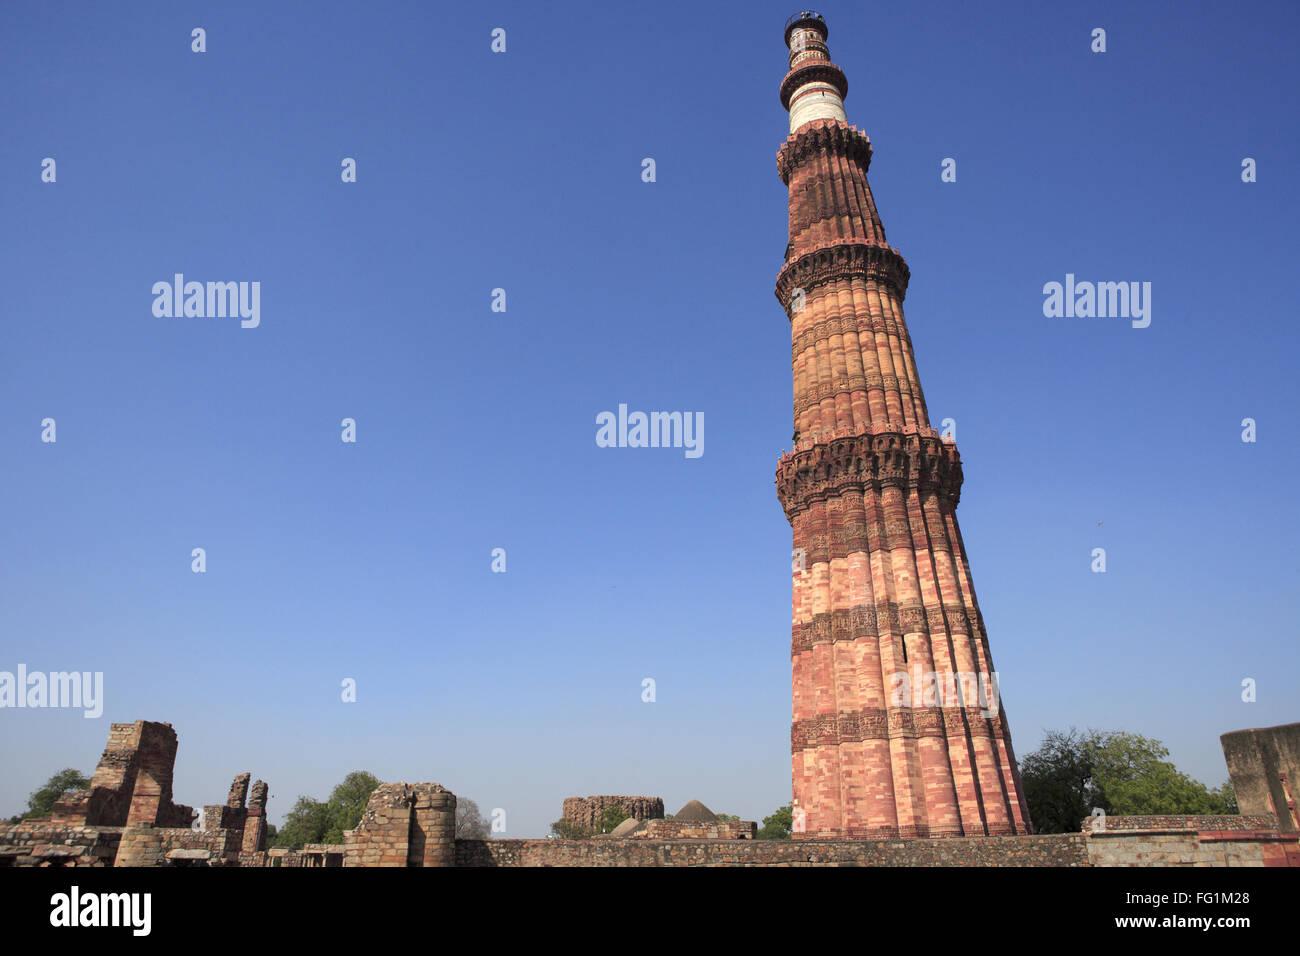 db56771eaa98 Qutab Minar built in 1311red sandstone tower